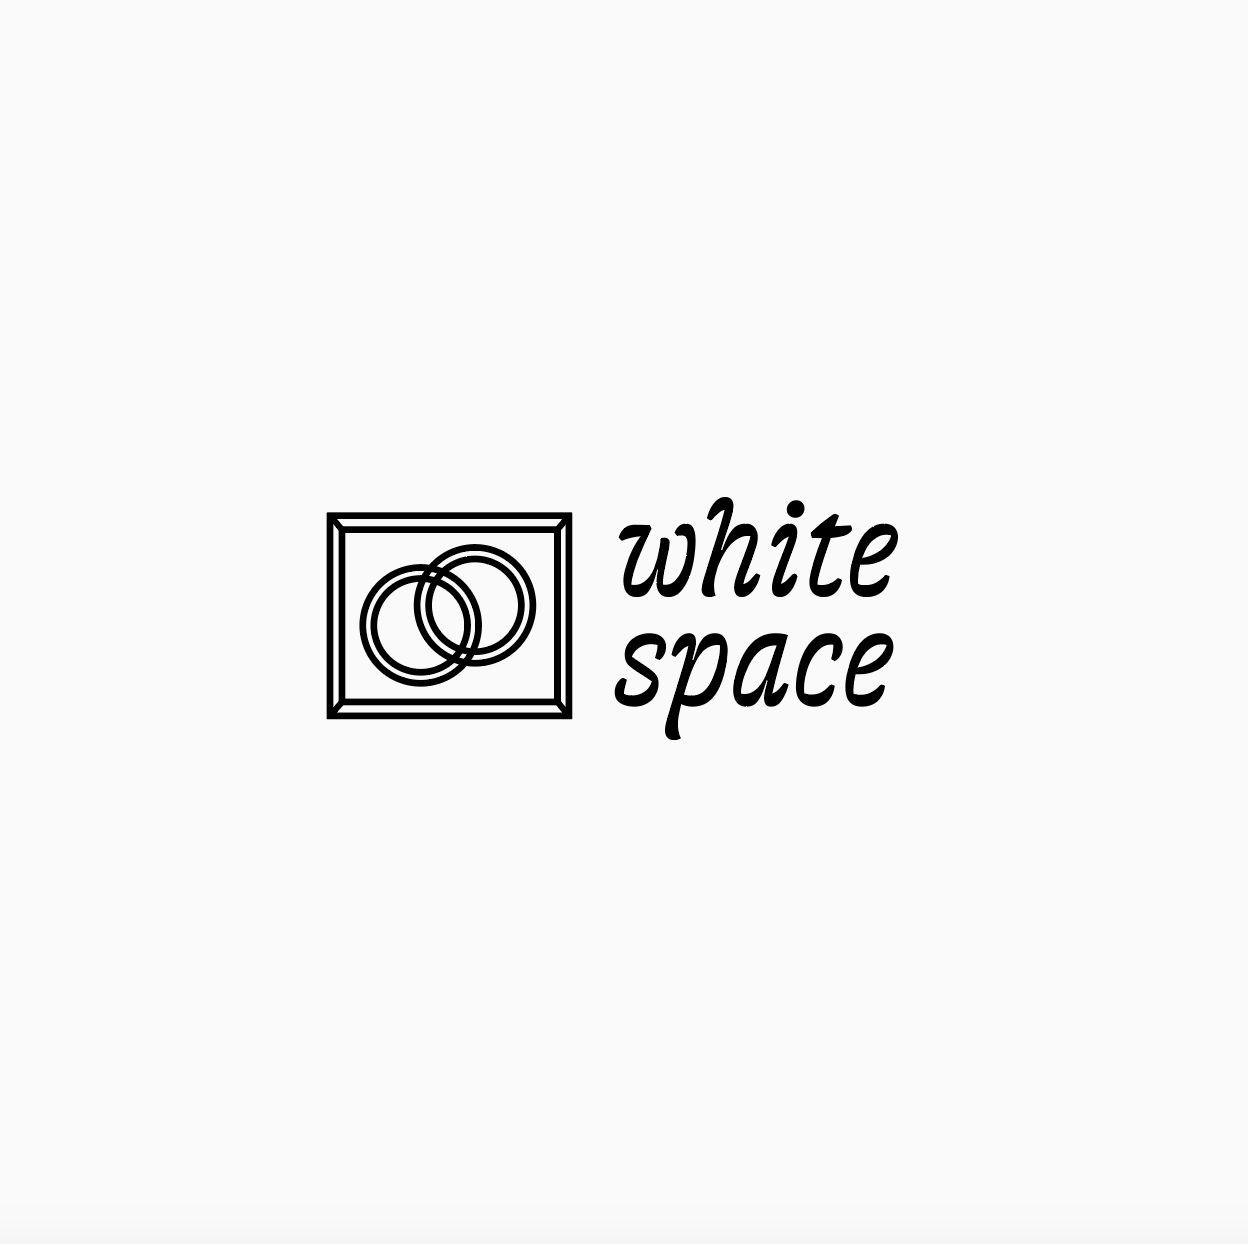 Логотип для Логотип для Фото и Видео продакшена - дизайнер RomanPetrov